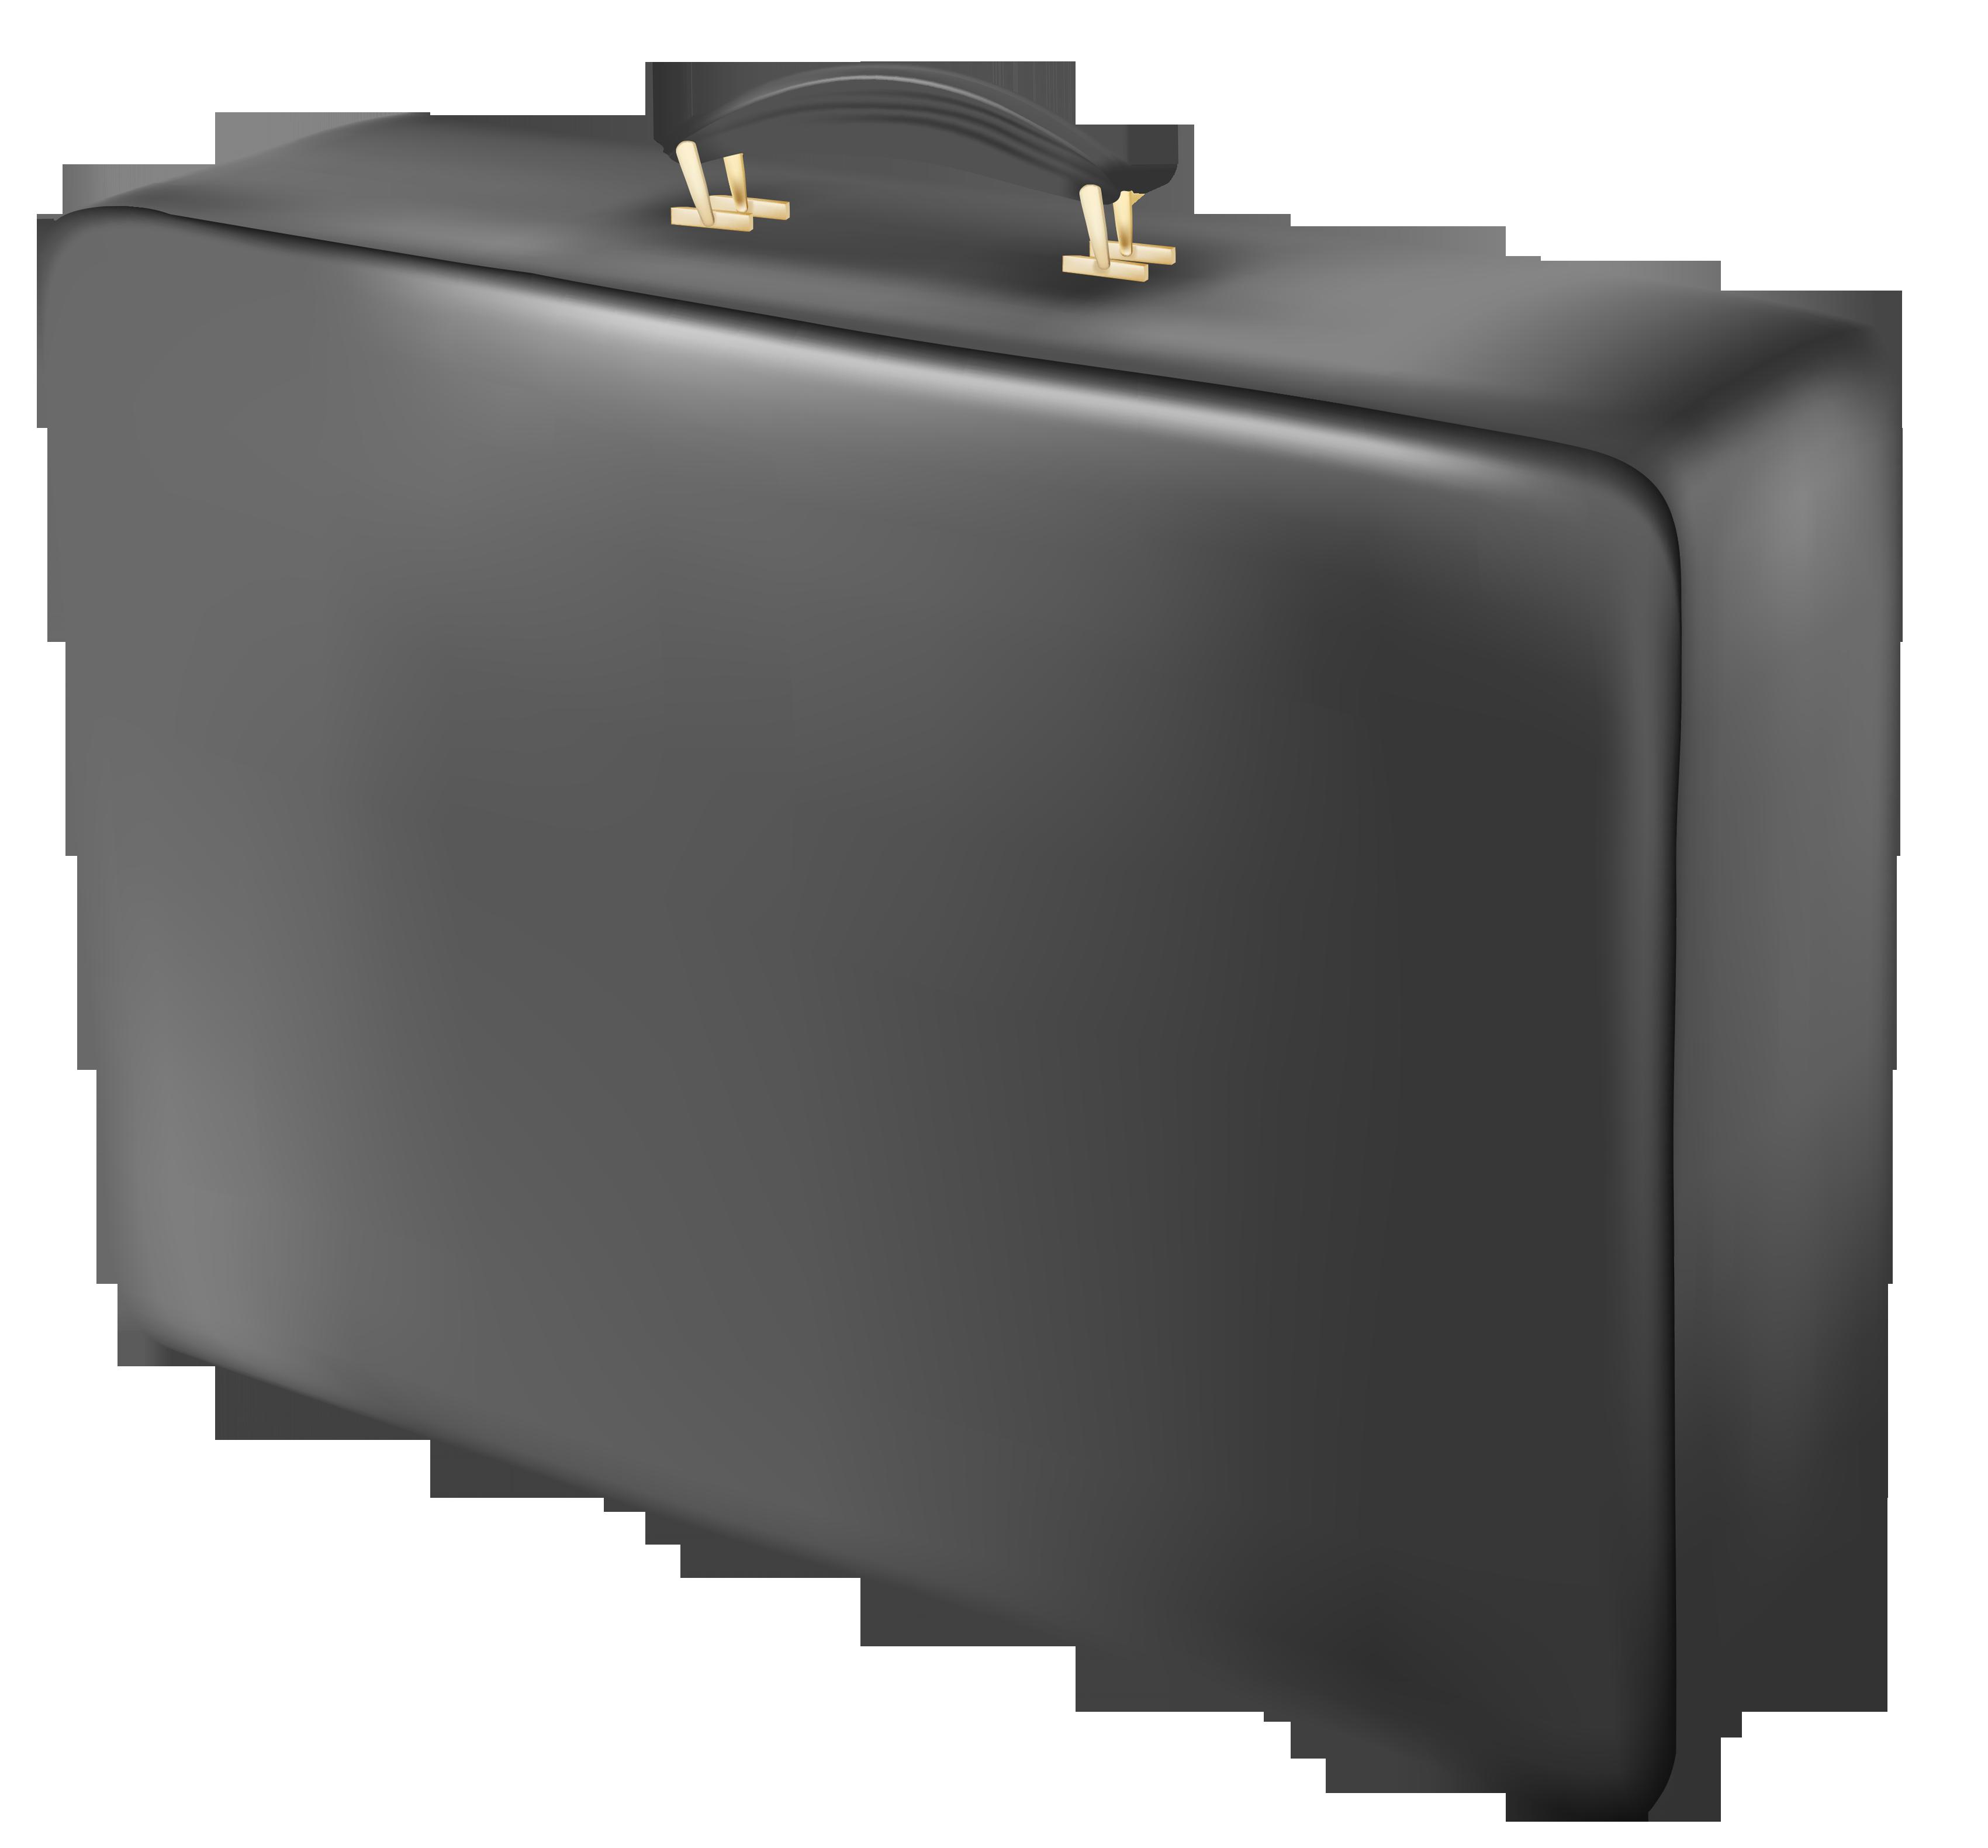 Suitcase Black PNG Image